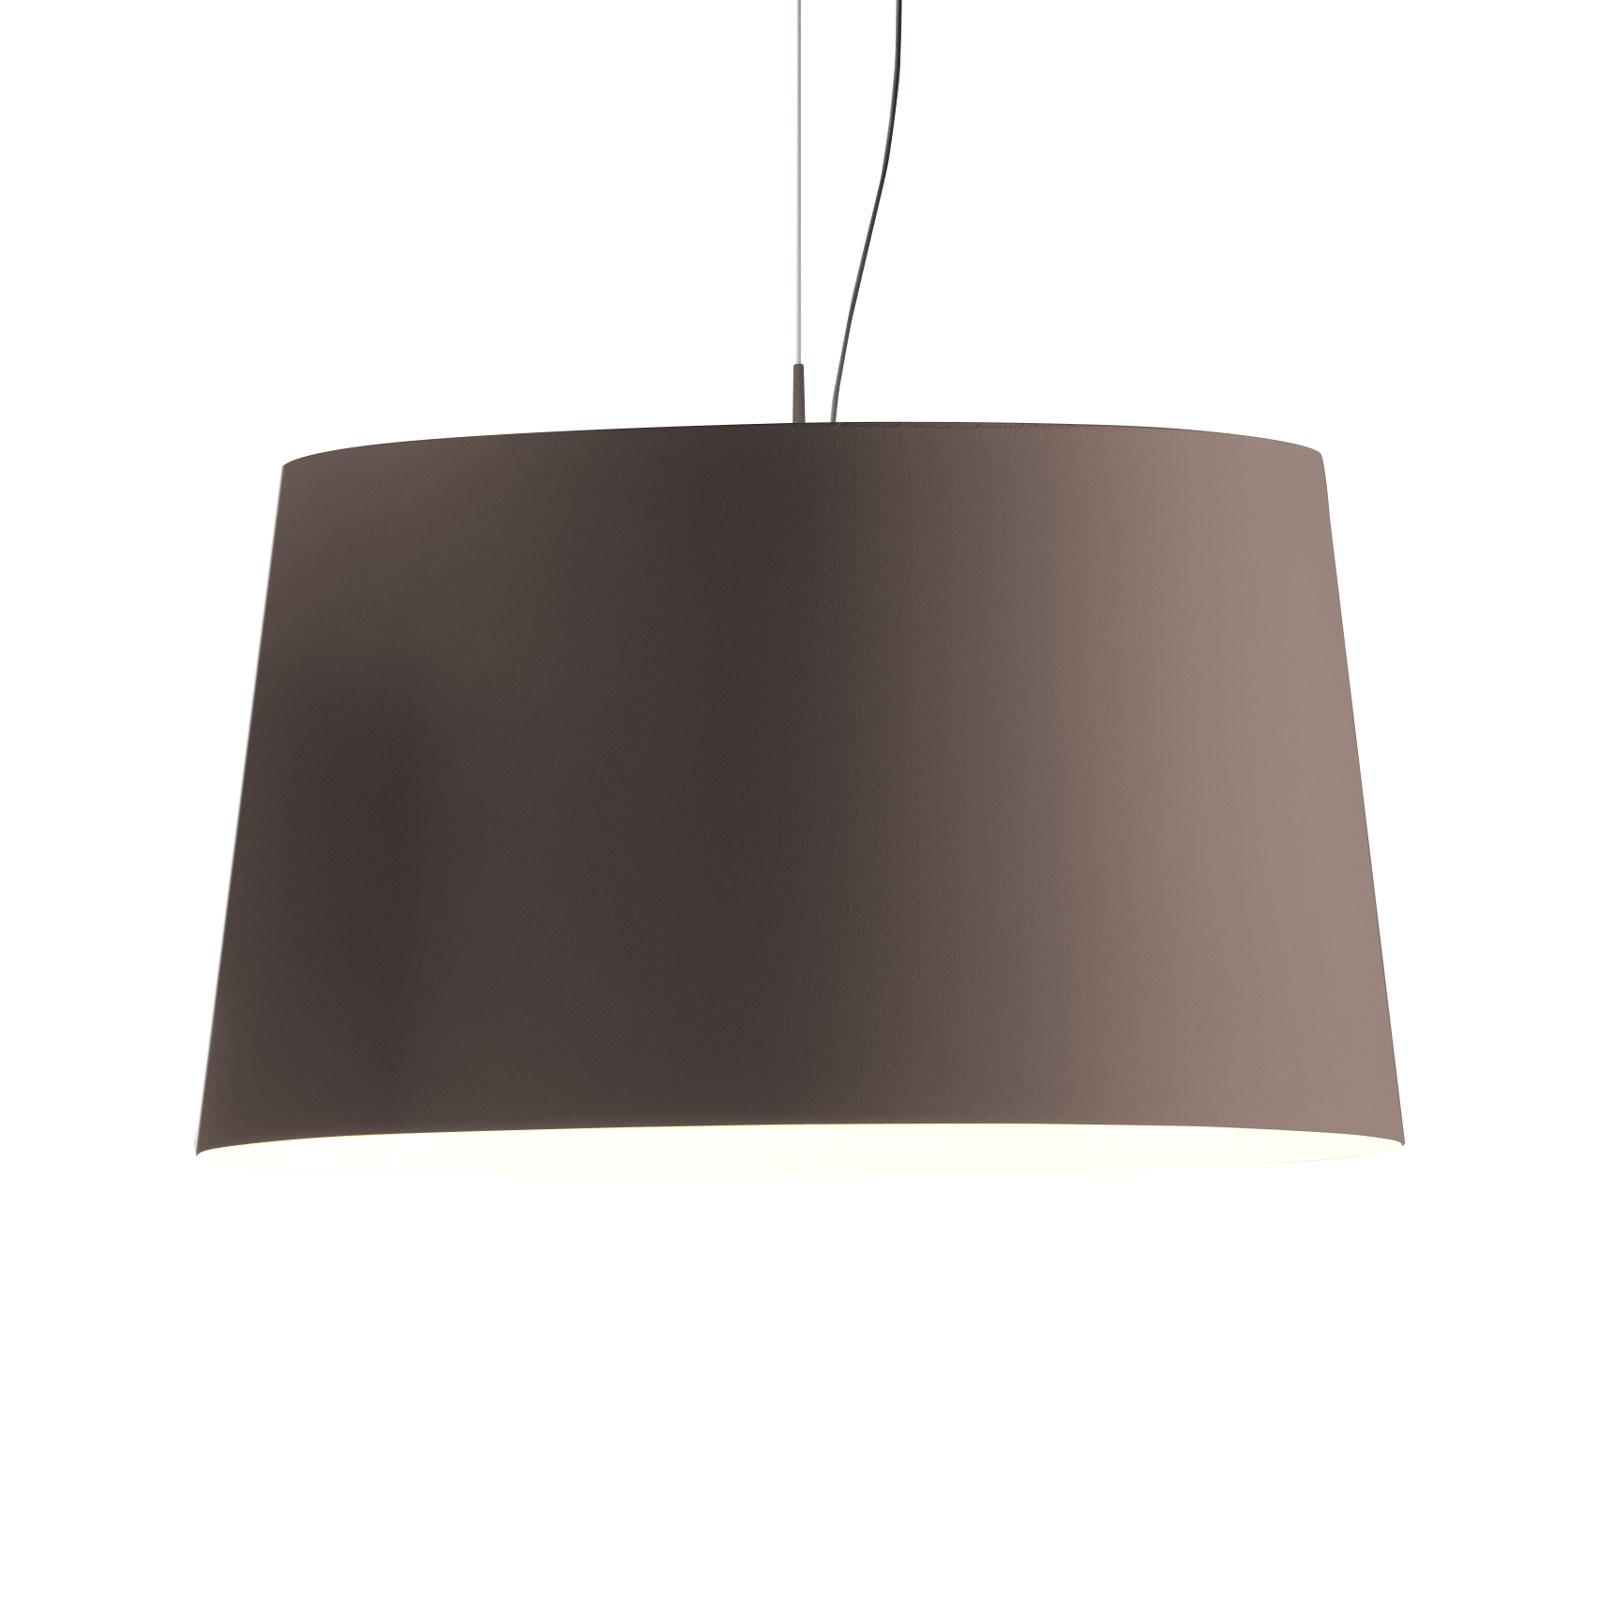 Vibia Warm 4926 hanglamp, bruin